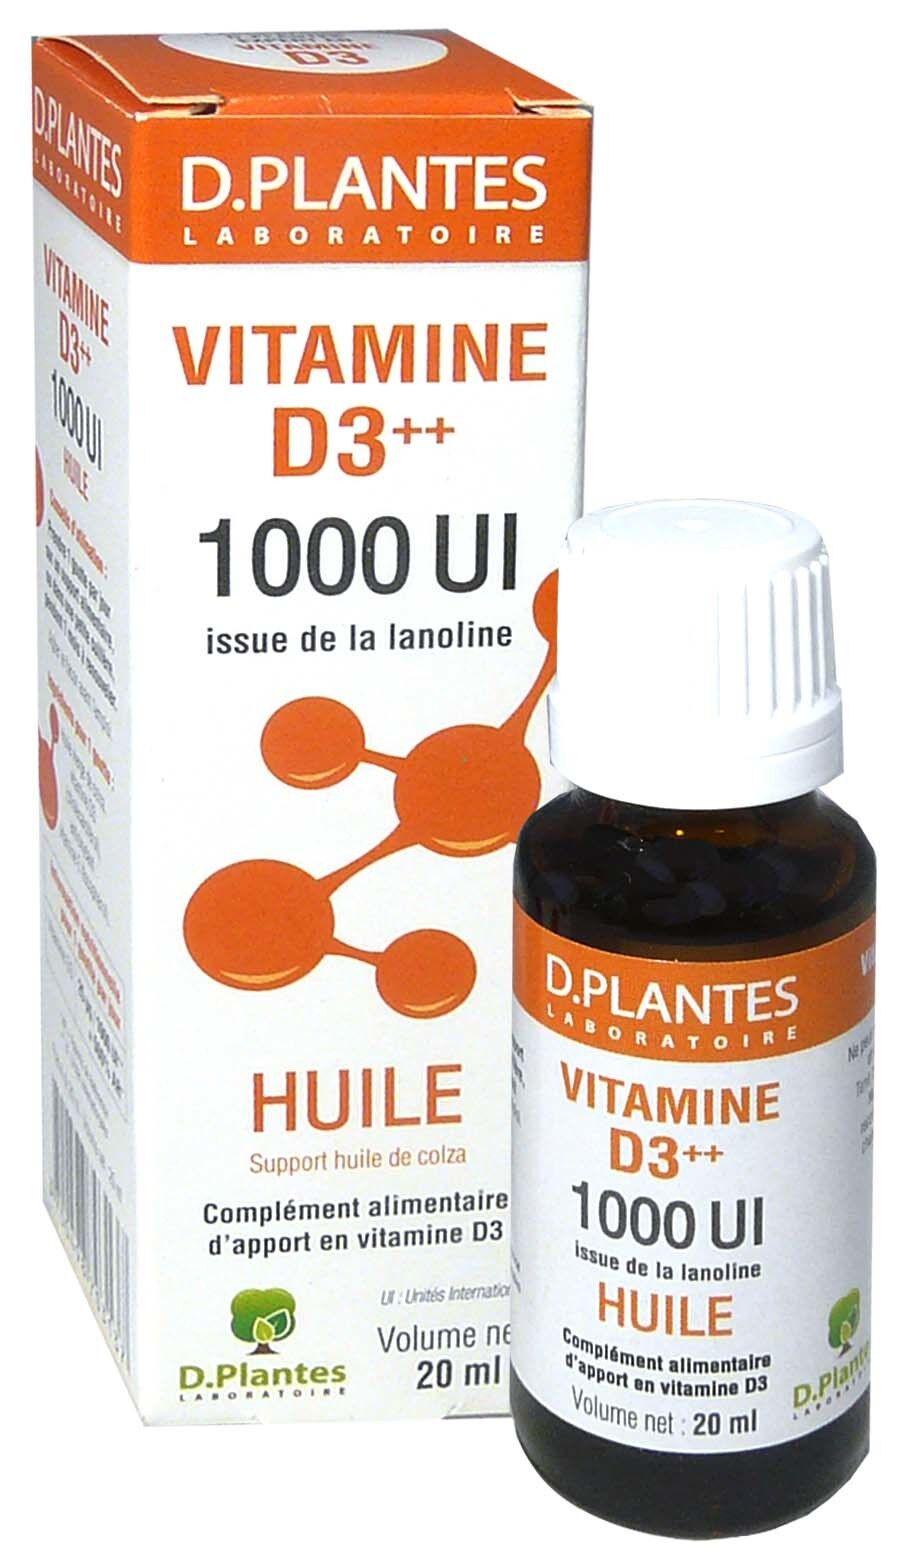 D. PLANTES D-plantes vitamine d3 huile 1000ul 20ml